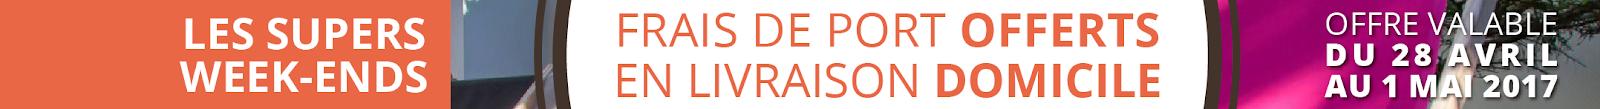 Proloisirs supers week-ends FDP bannière.jpg